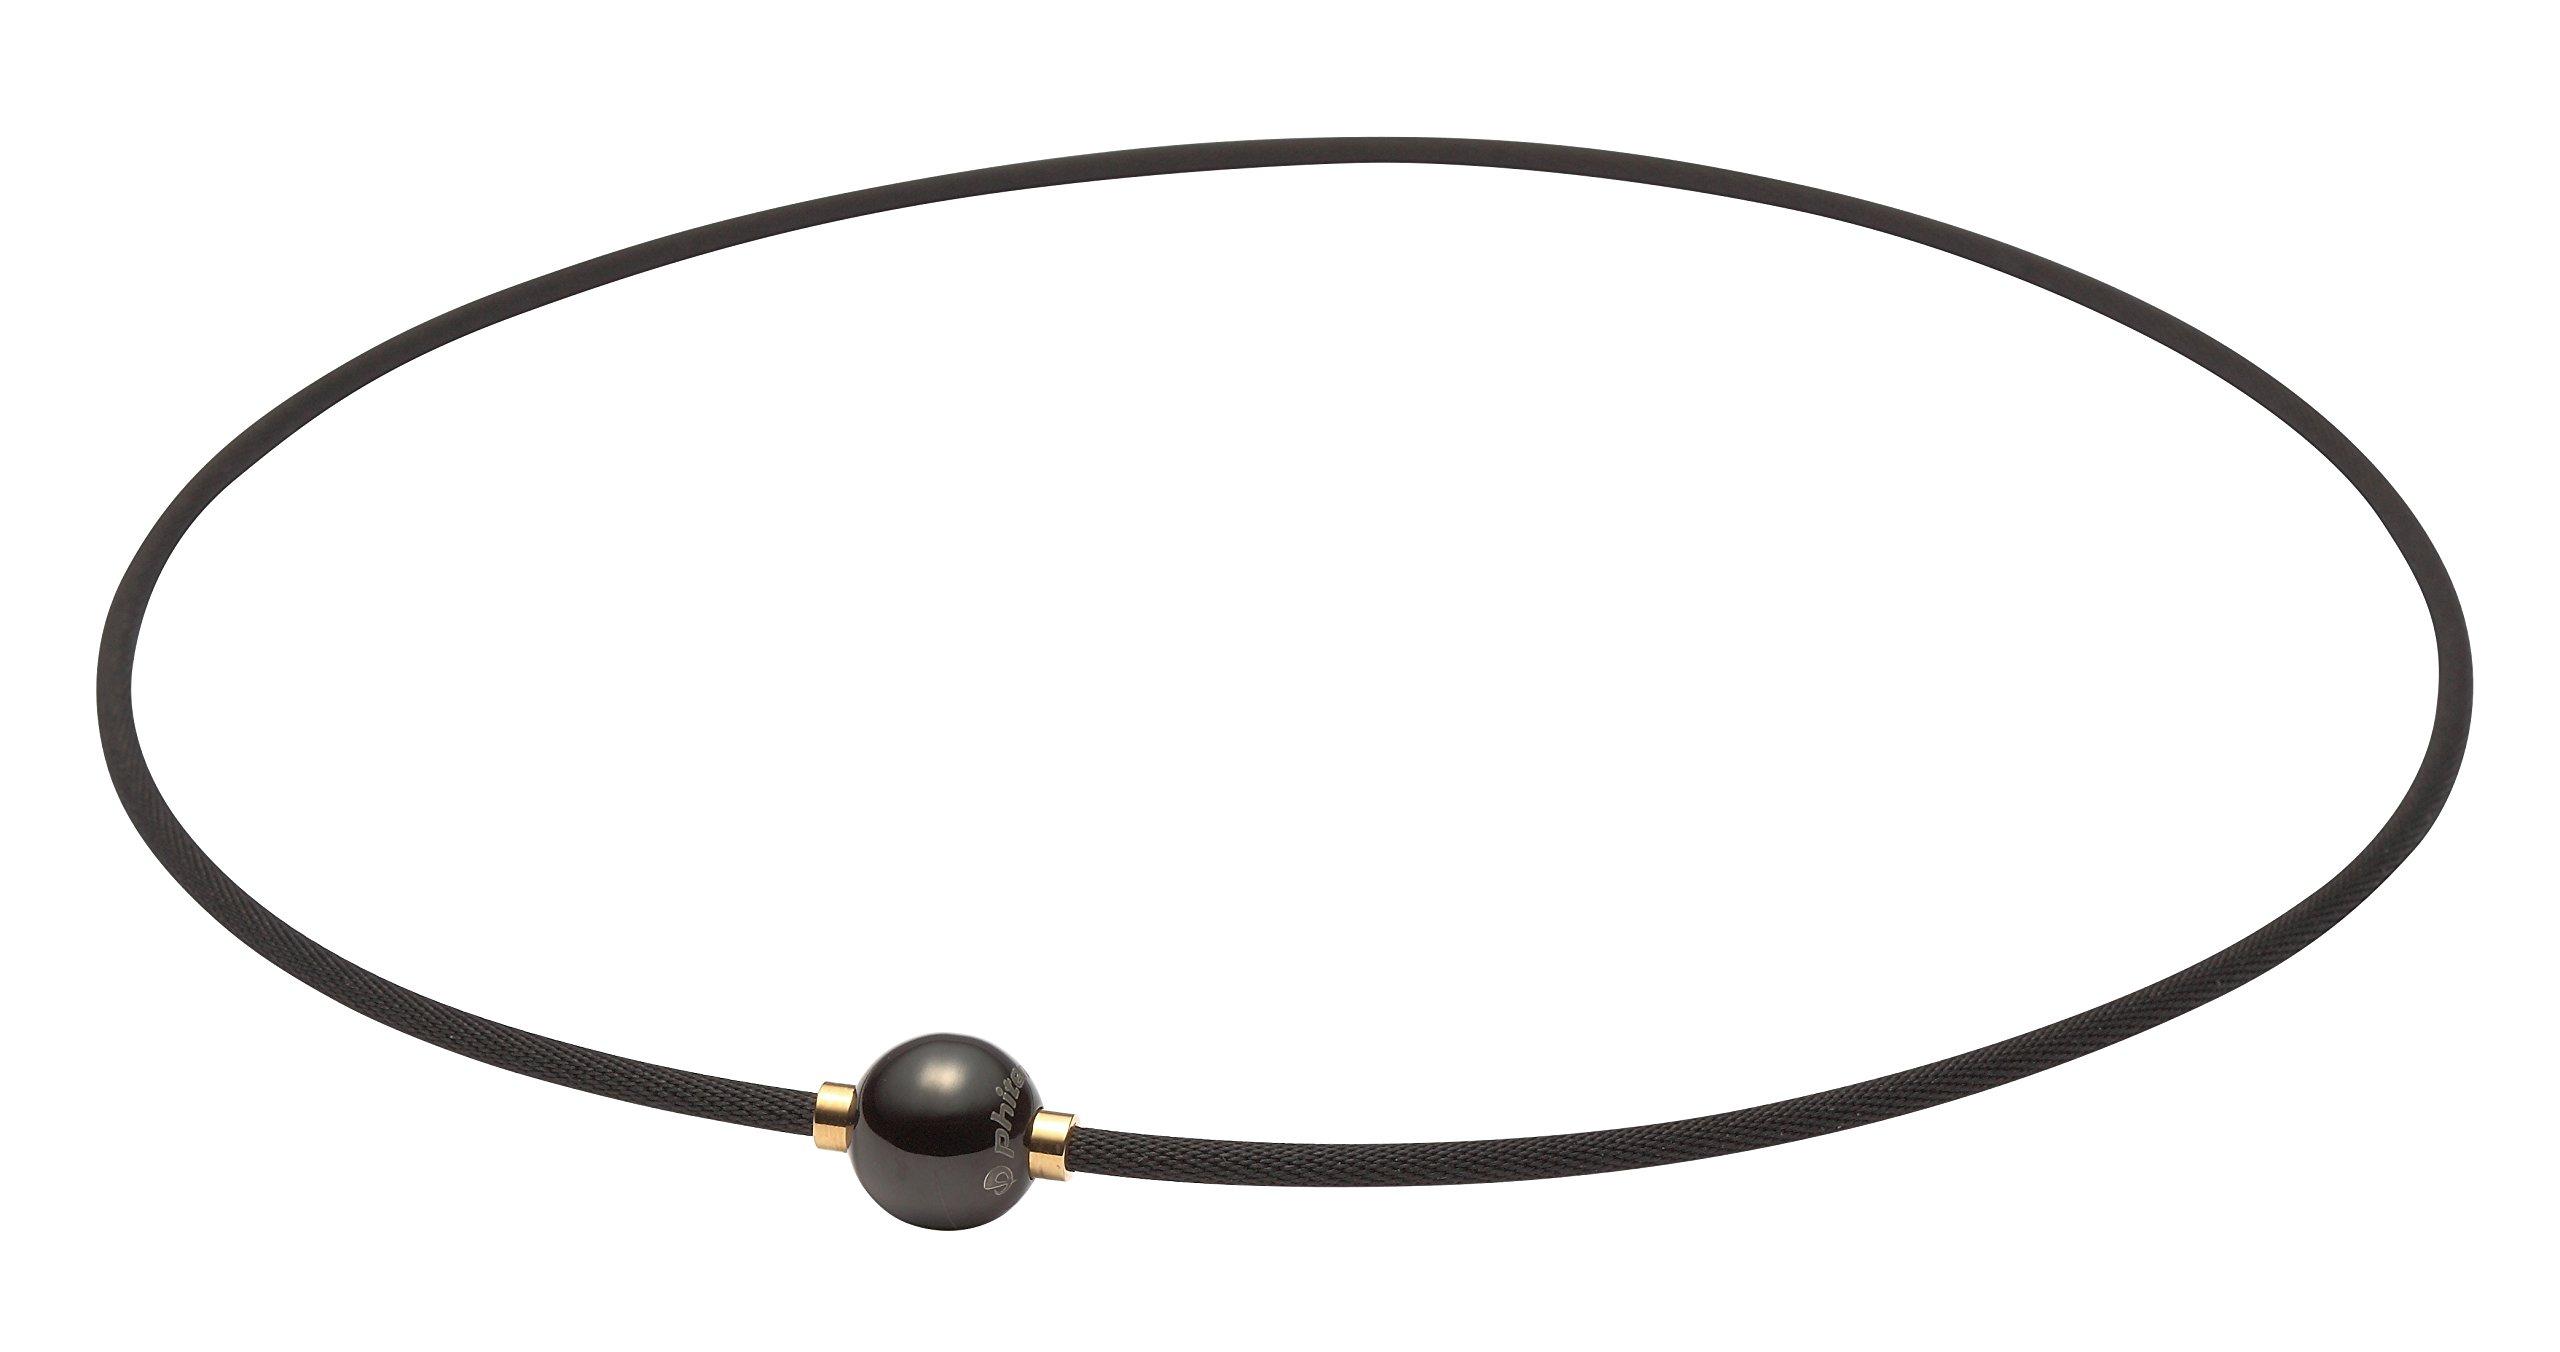 Phiten RAKUWA Necklace X100 Mirror Ball Titanium Care Designed in JAPAN [Japan Import] (15.7'' (40cm), Black x Gold)